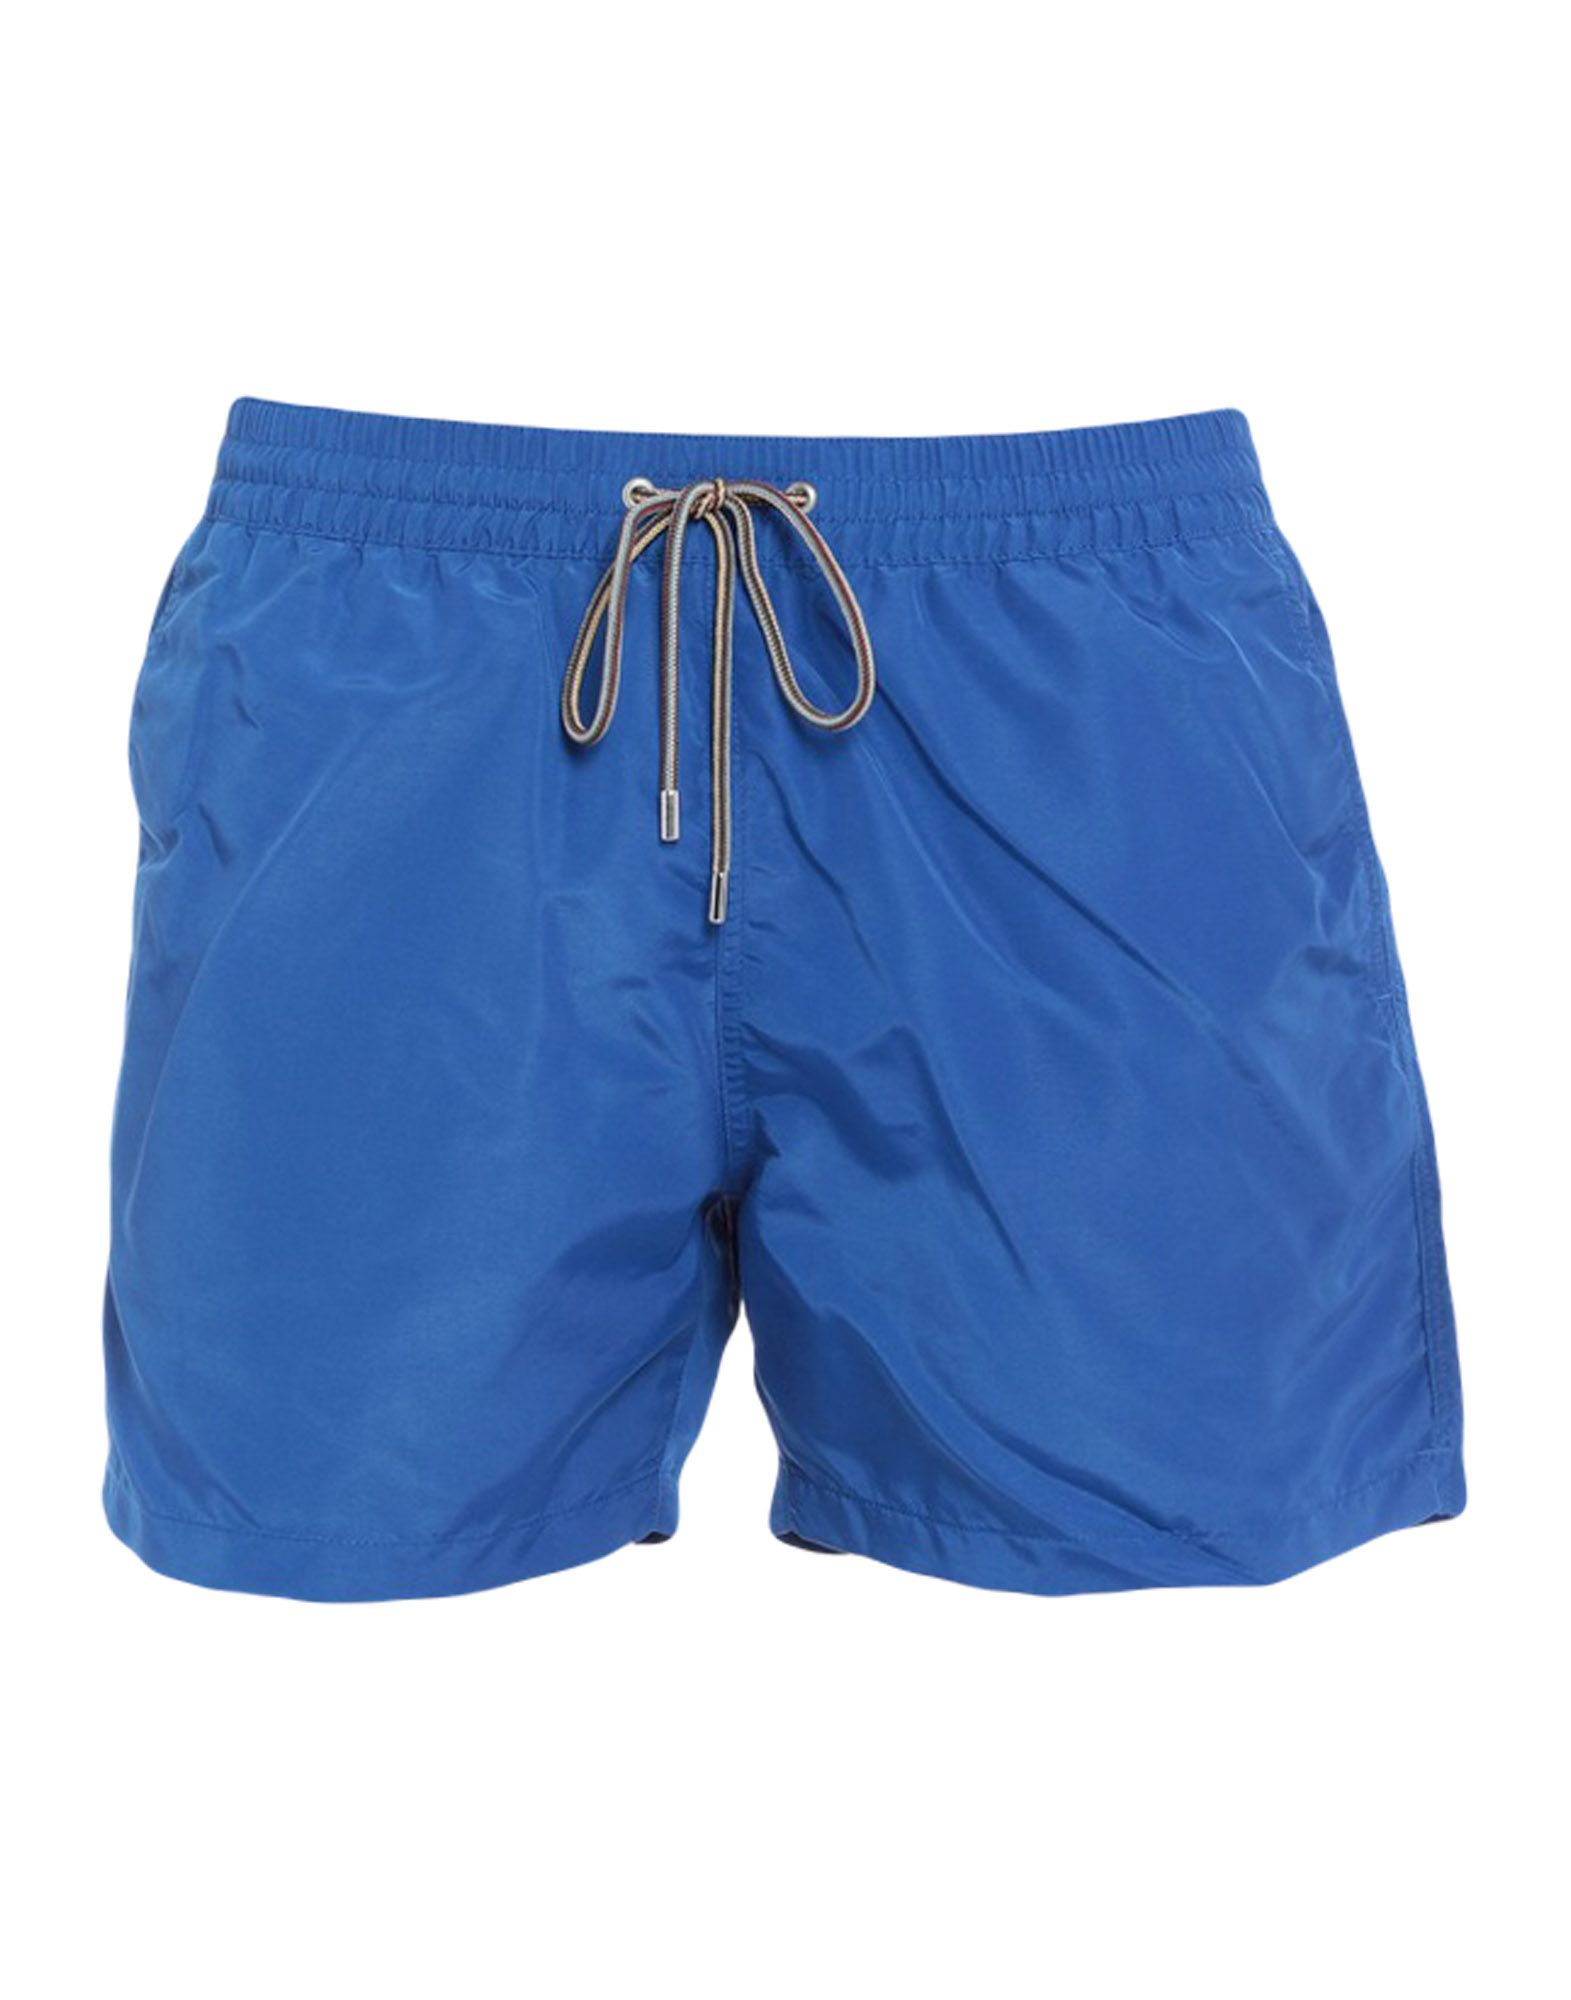 PAUL SMITH SWIMWEAR Пляжные брюки и шорты мужские пляжные шорты menstore surf s001